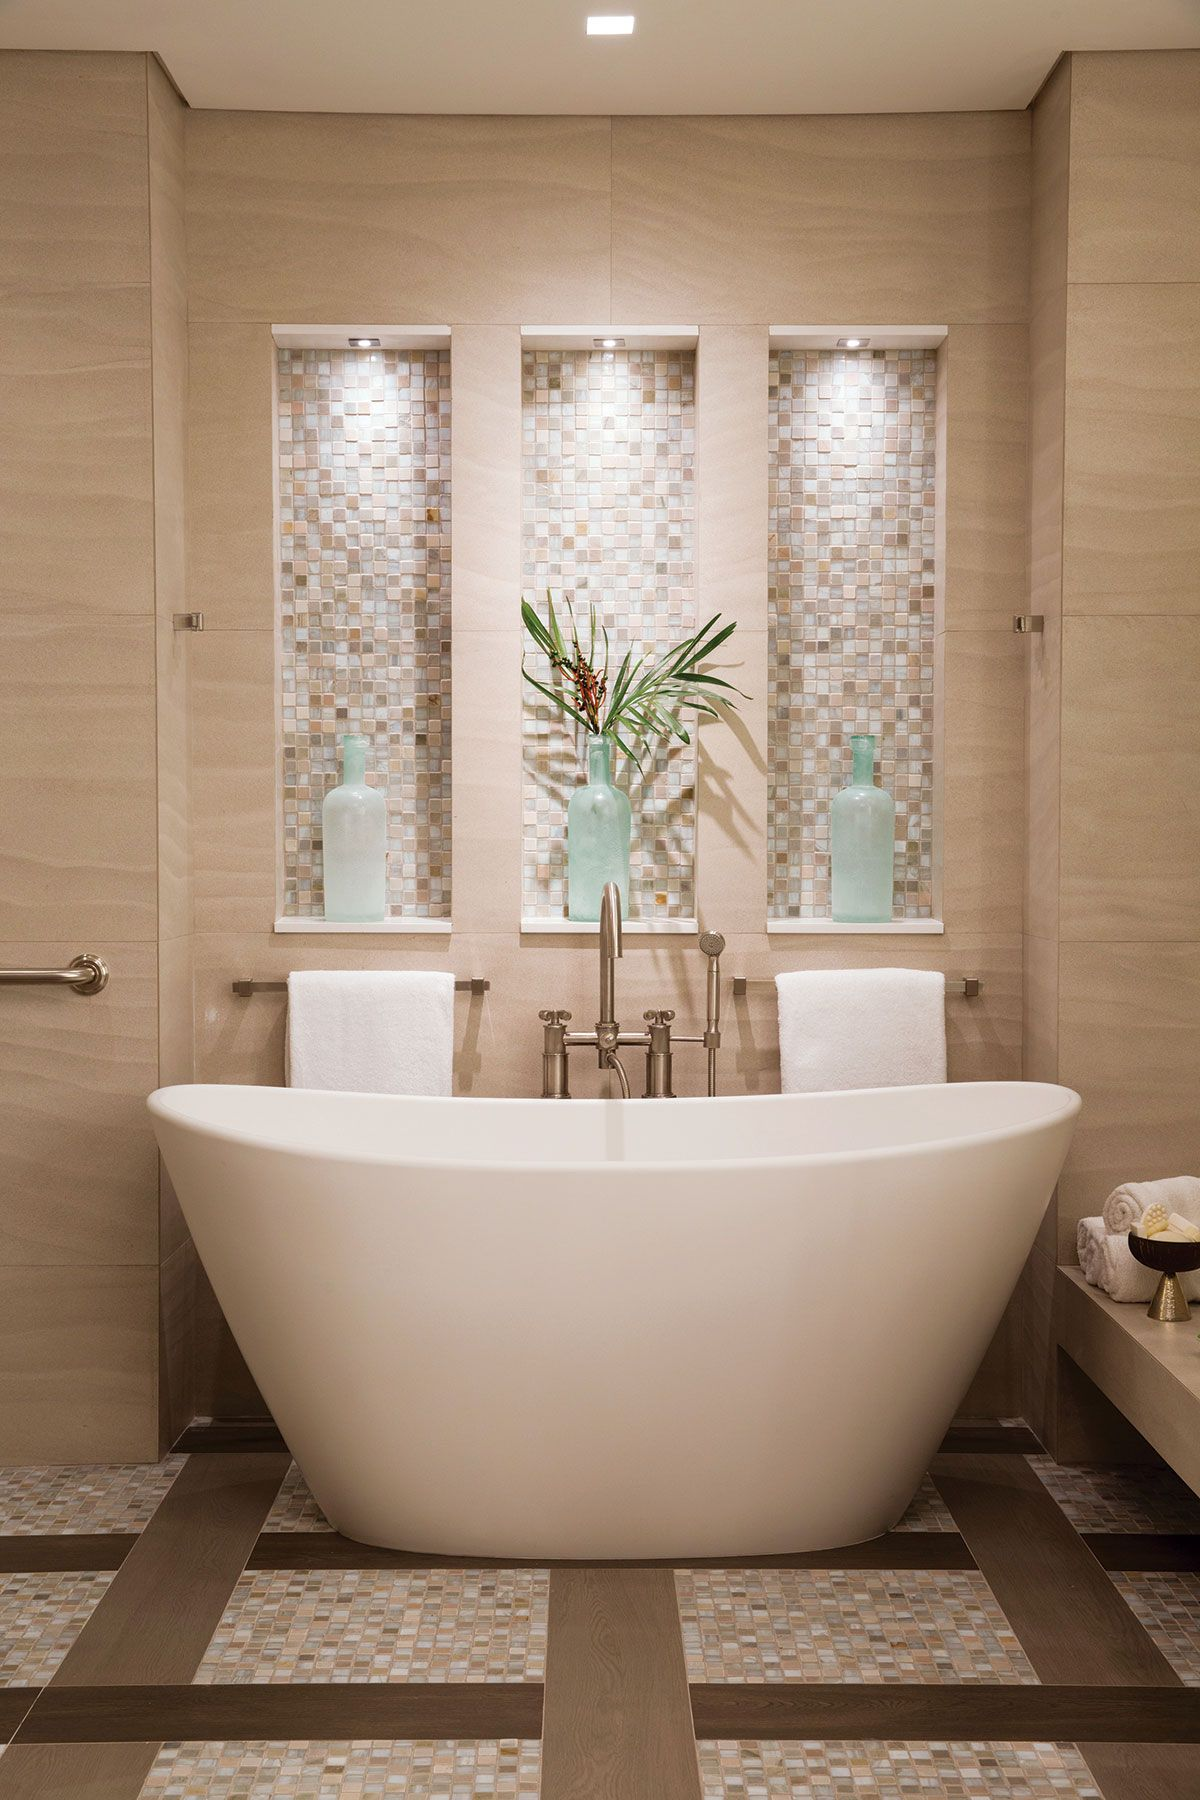 A Life Well Lived Spa Master Bathroom Luxury Spa Bathroom